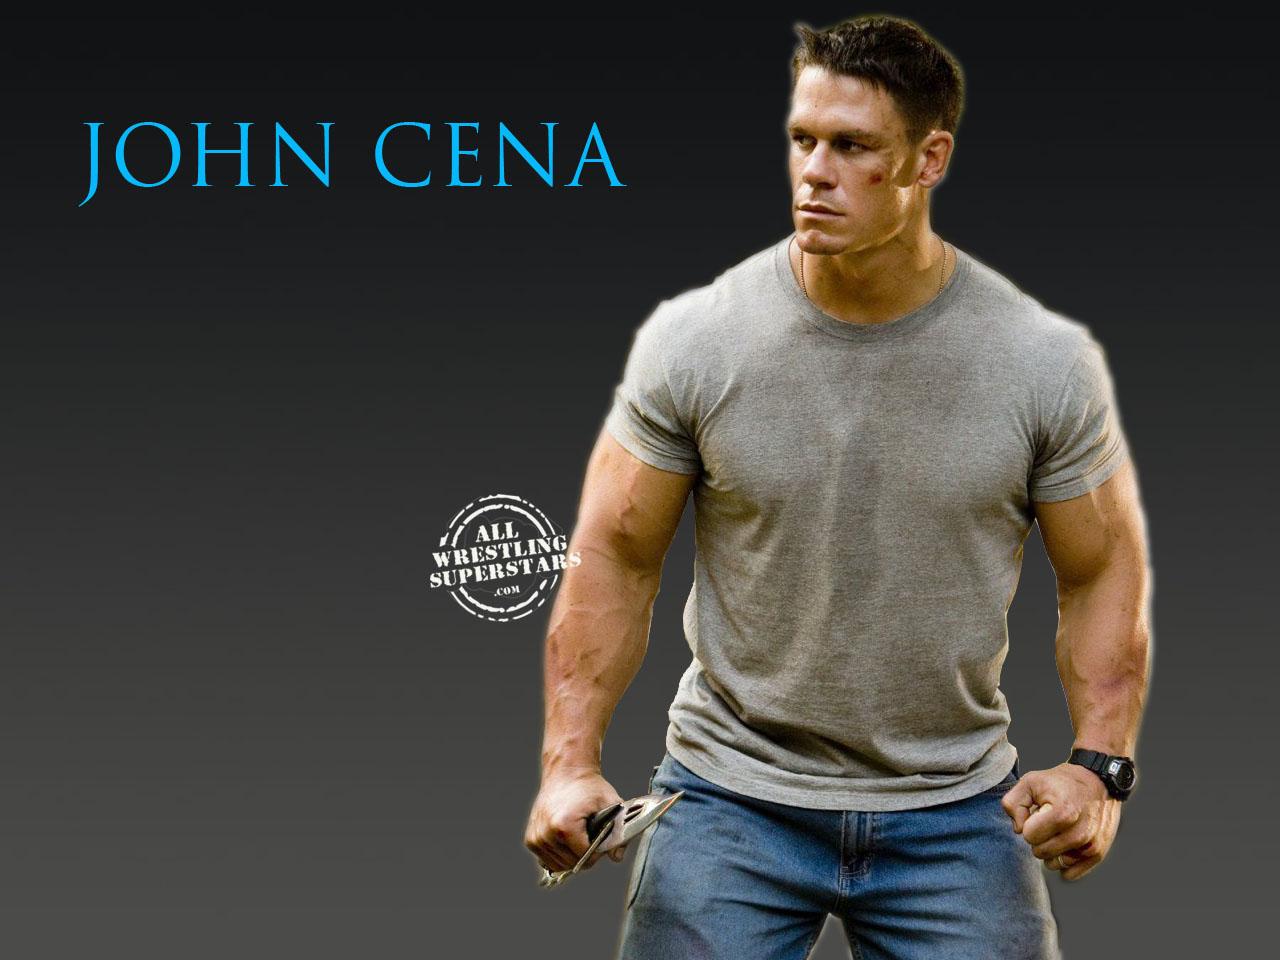 John Cena S Wallpaper 1280x960 77022